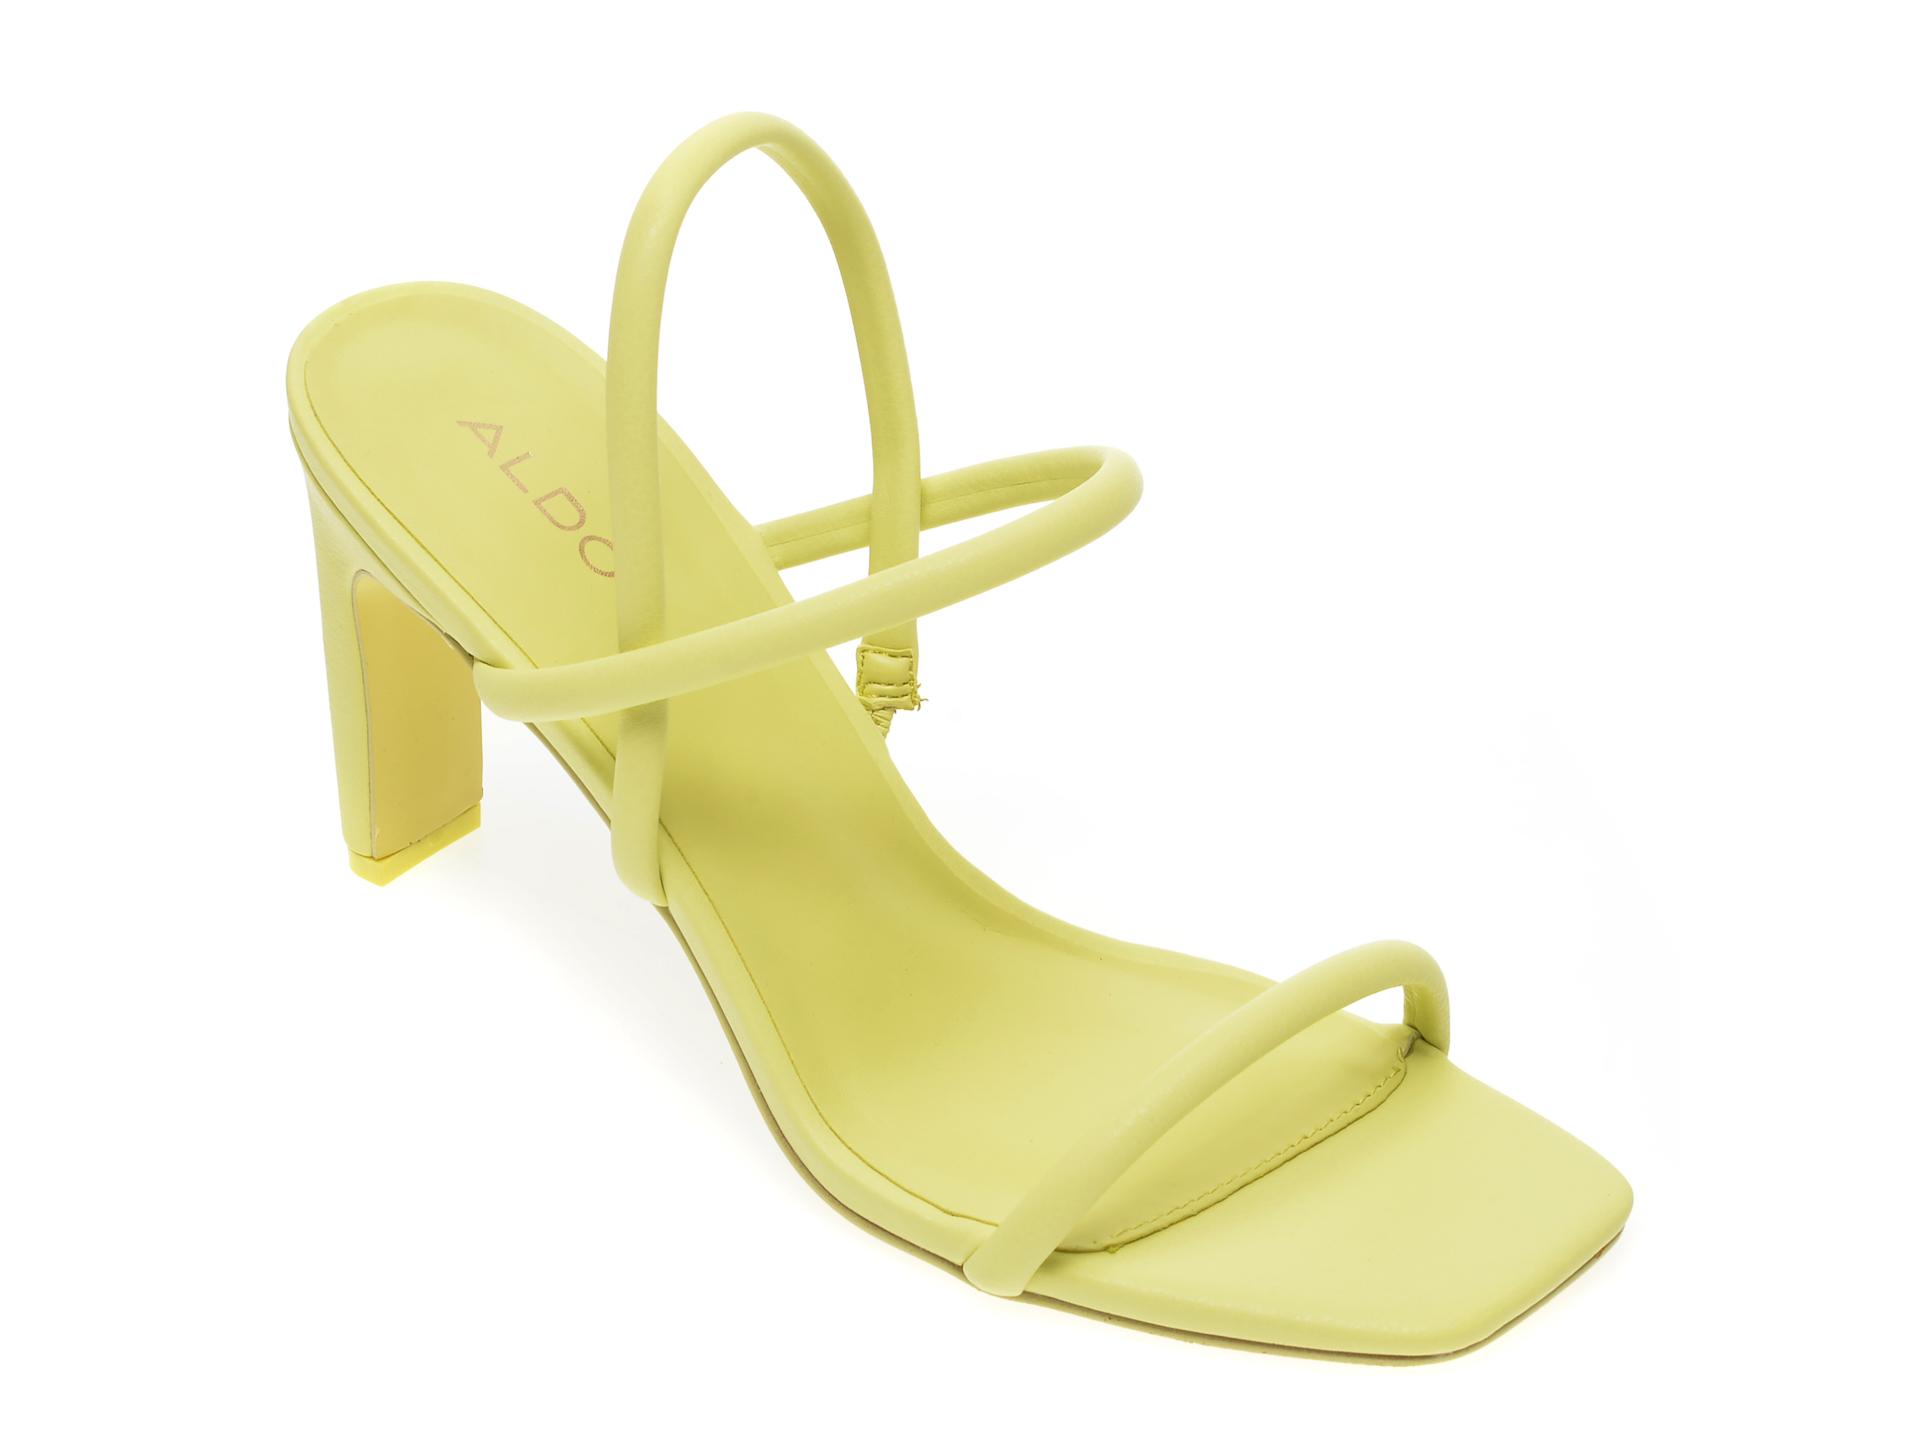 Sandale ALDO verzi, Karla330, din piele ecologica imagine